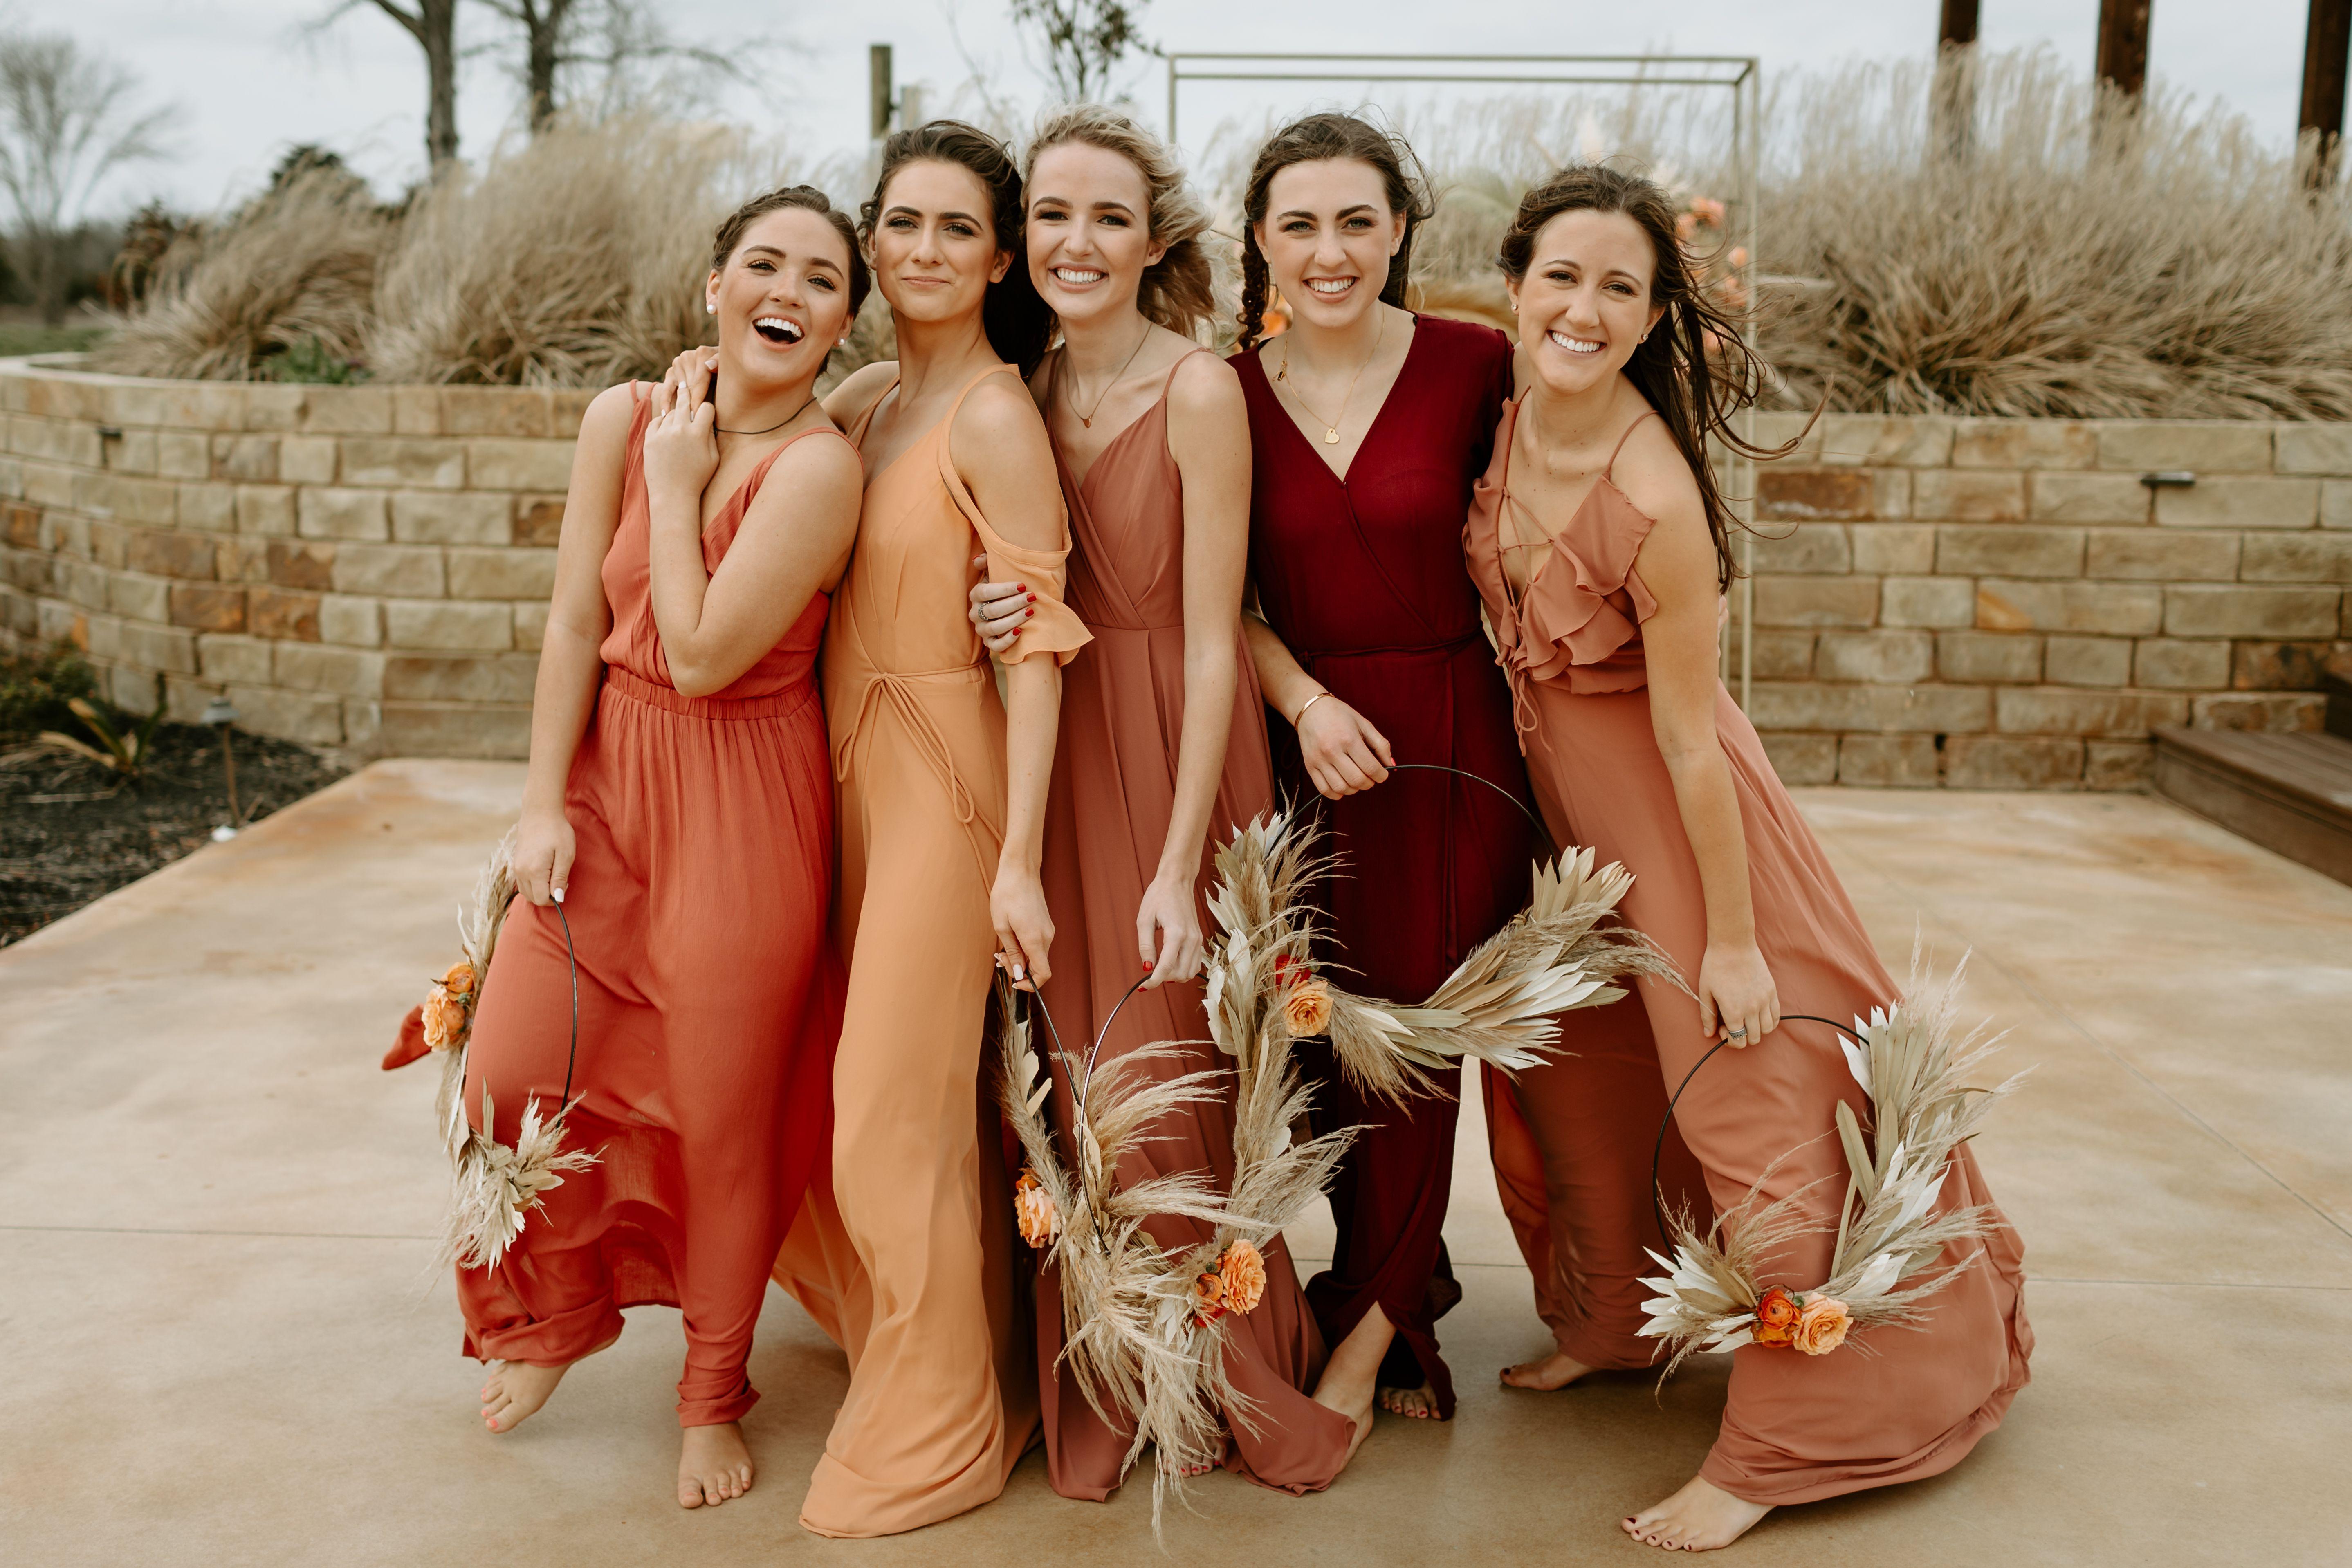 Summer Mix Matched Bridesmaid Dresses Texas Wedding Photography Different Bridesmaid Dresses Mix Match Bridesmaids Dresses Fall Bridesmaid Dresses [ 3835 x 5752 Pixel ]